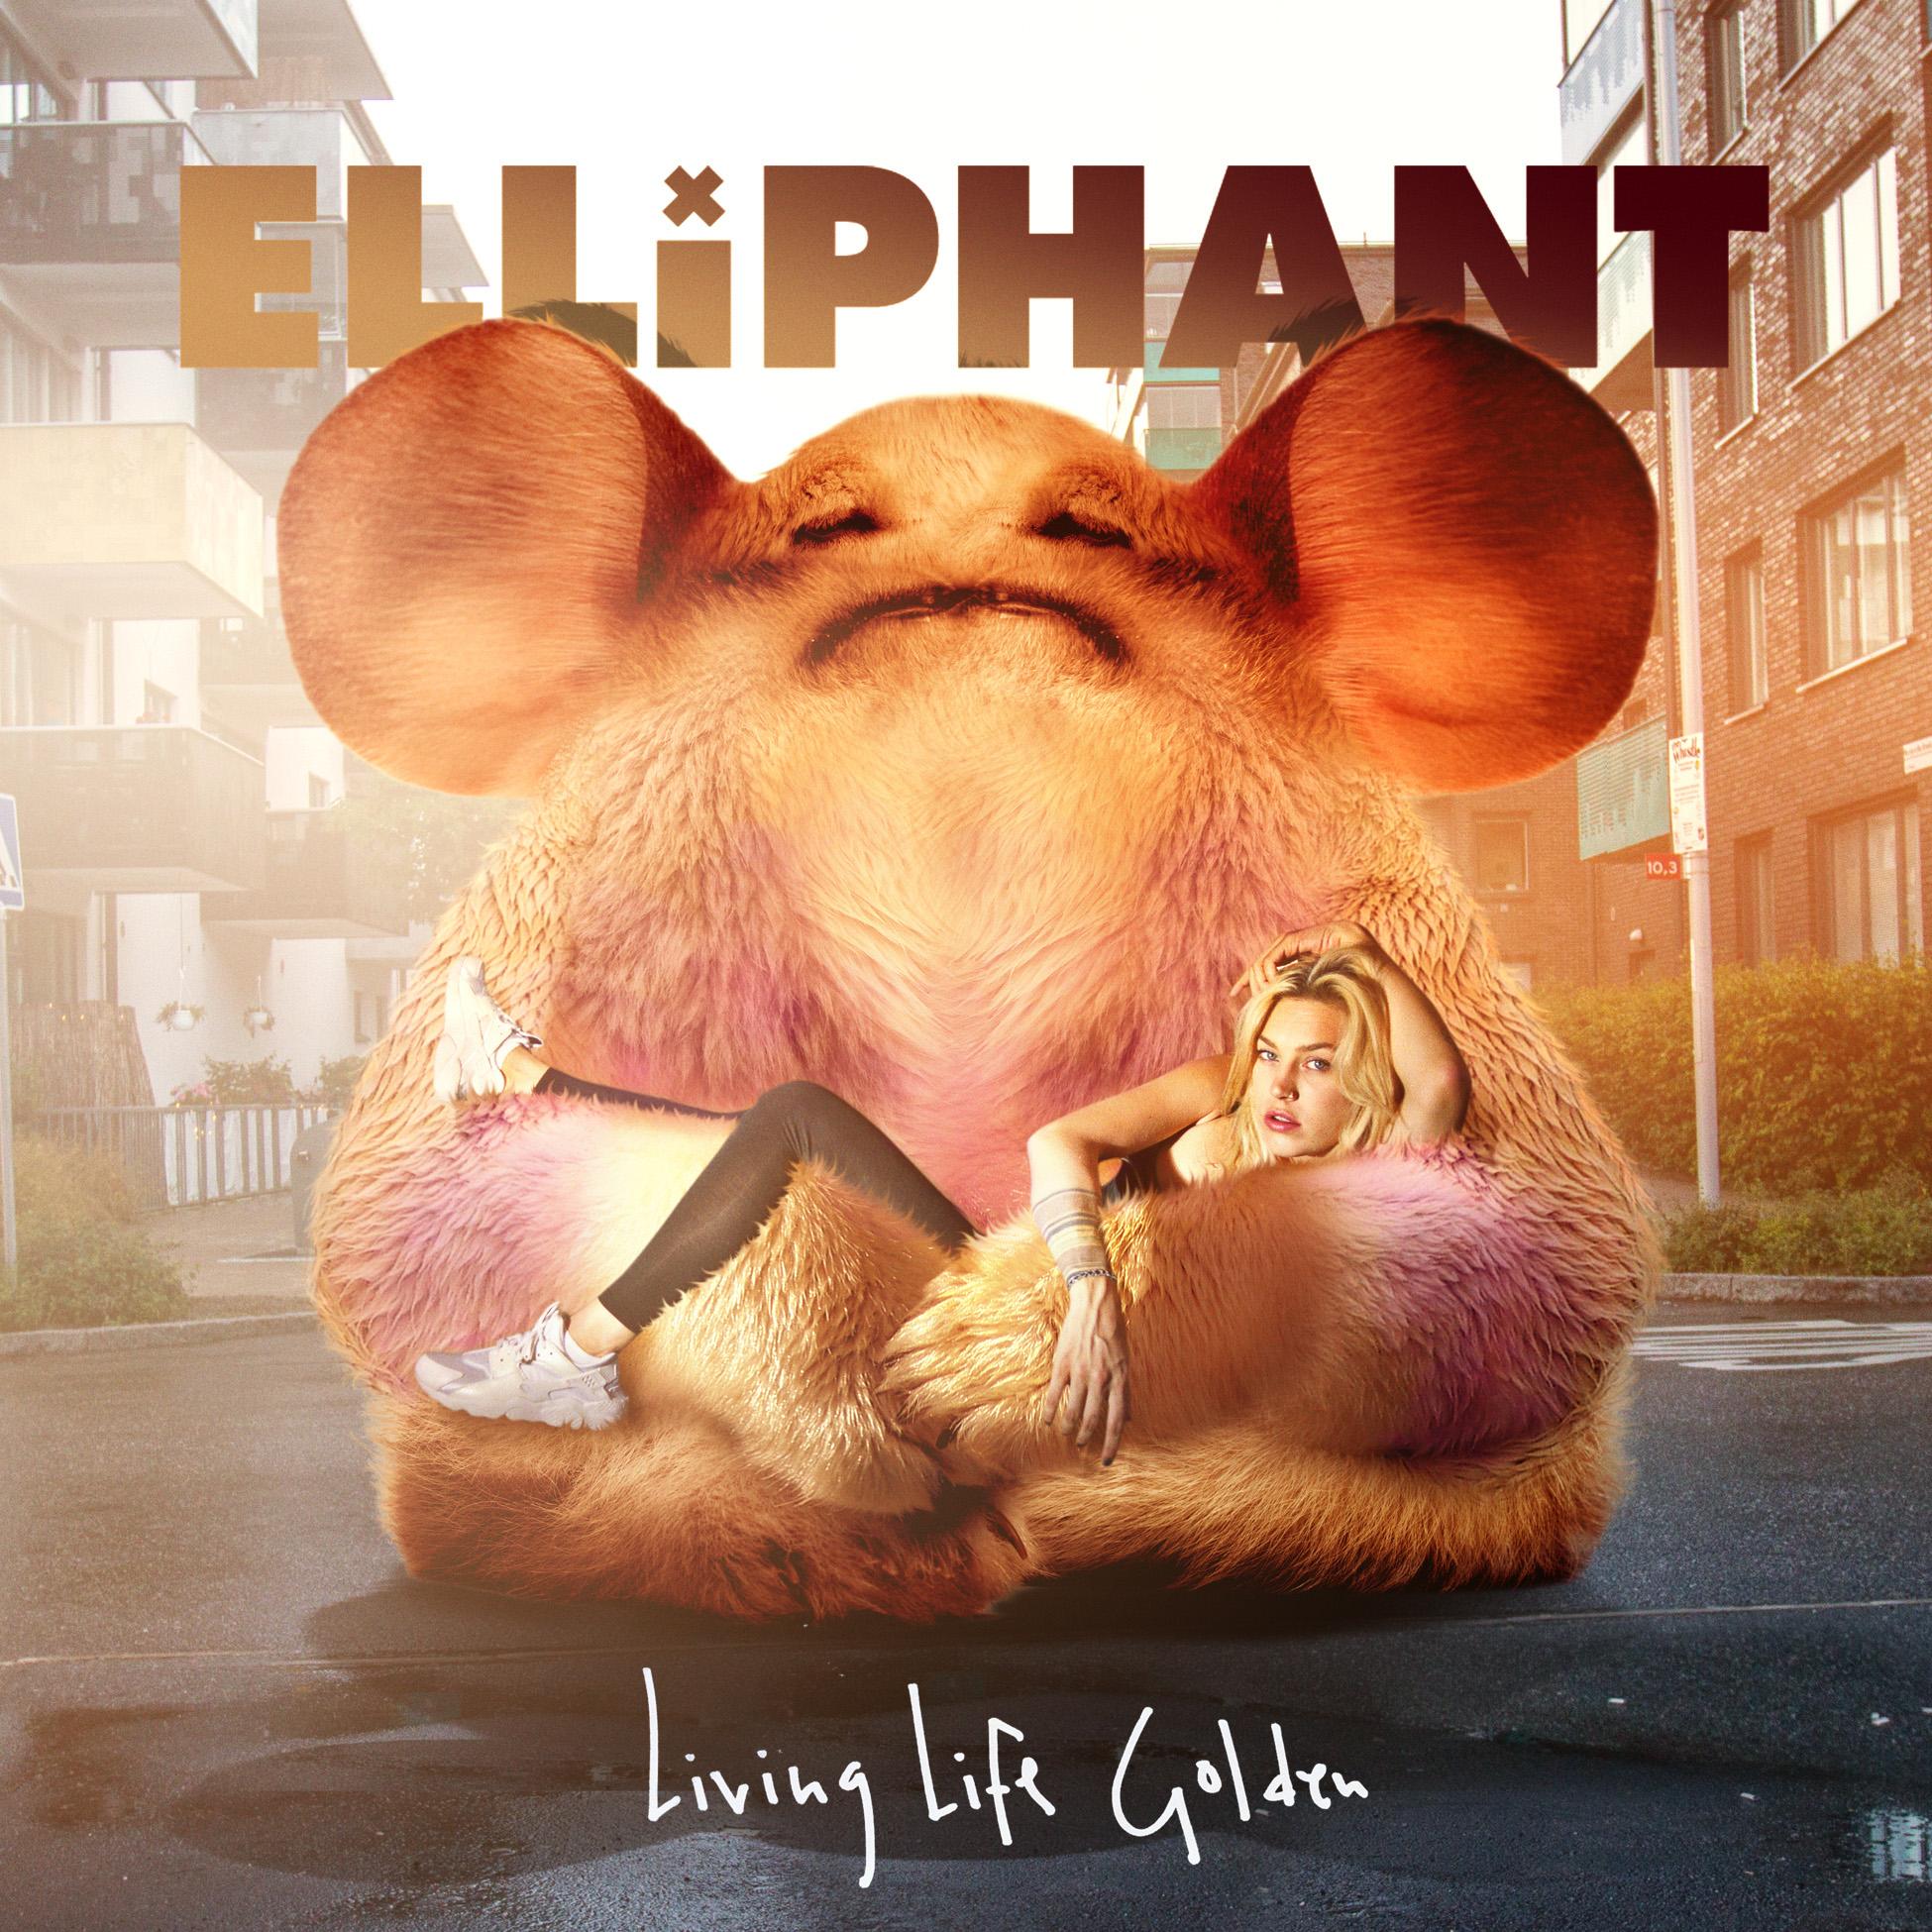 Elliphant_Living Life Golden_Album